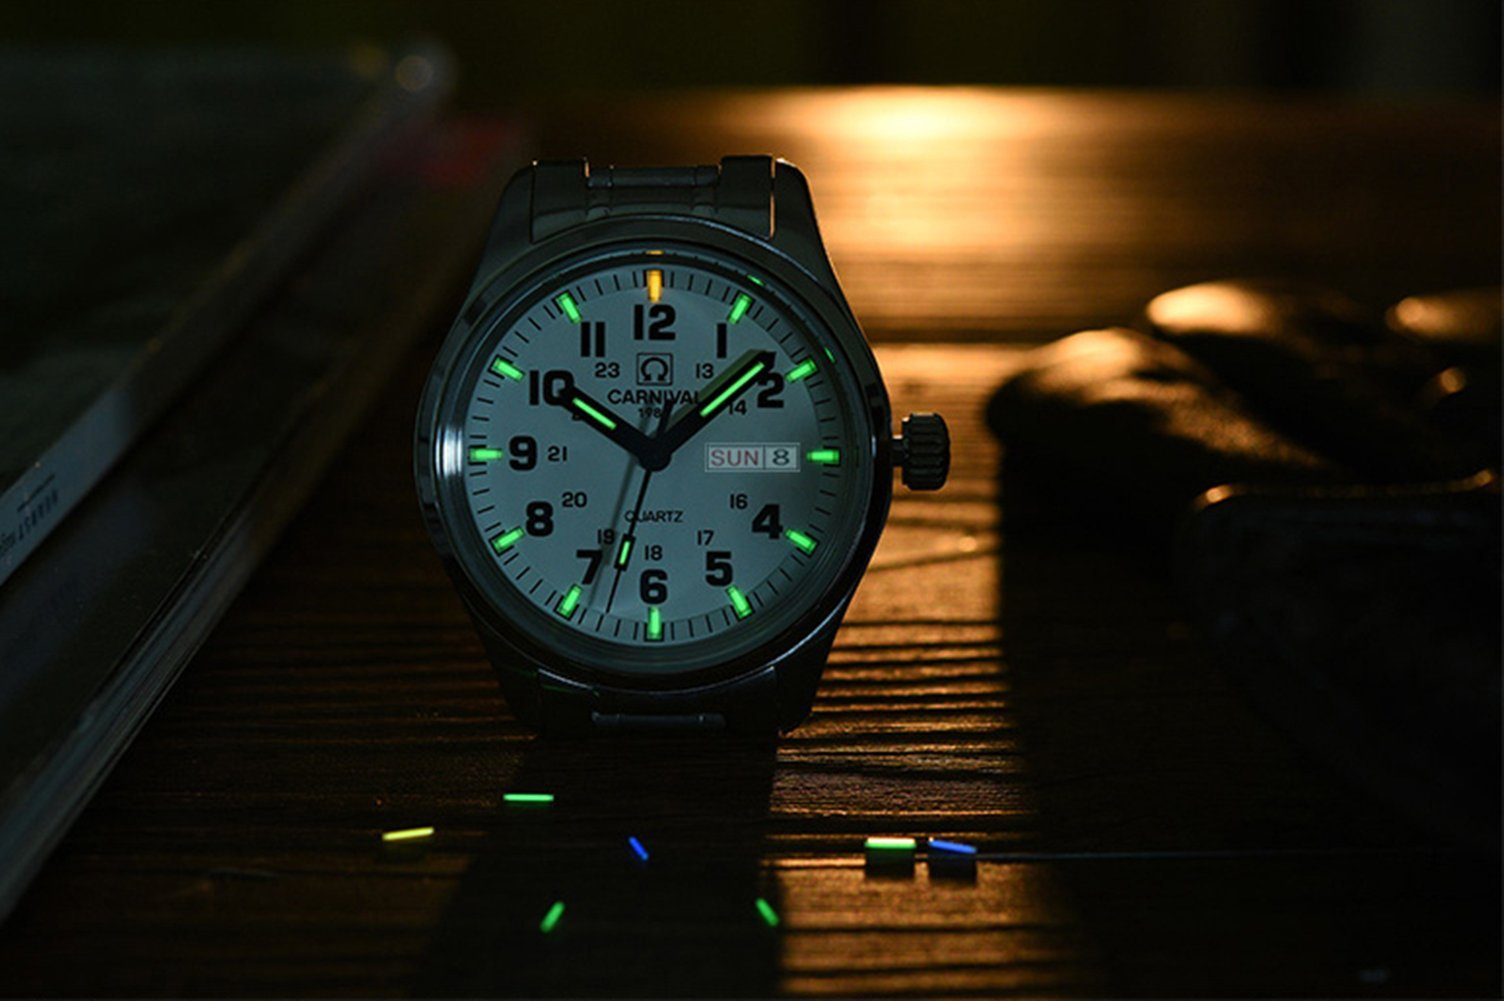 Luminous Wrist Watch waterproof stainless steel Tube Lamp Self Luminous 25 Years Fluorescent Watch for Outdoor Sports